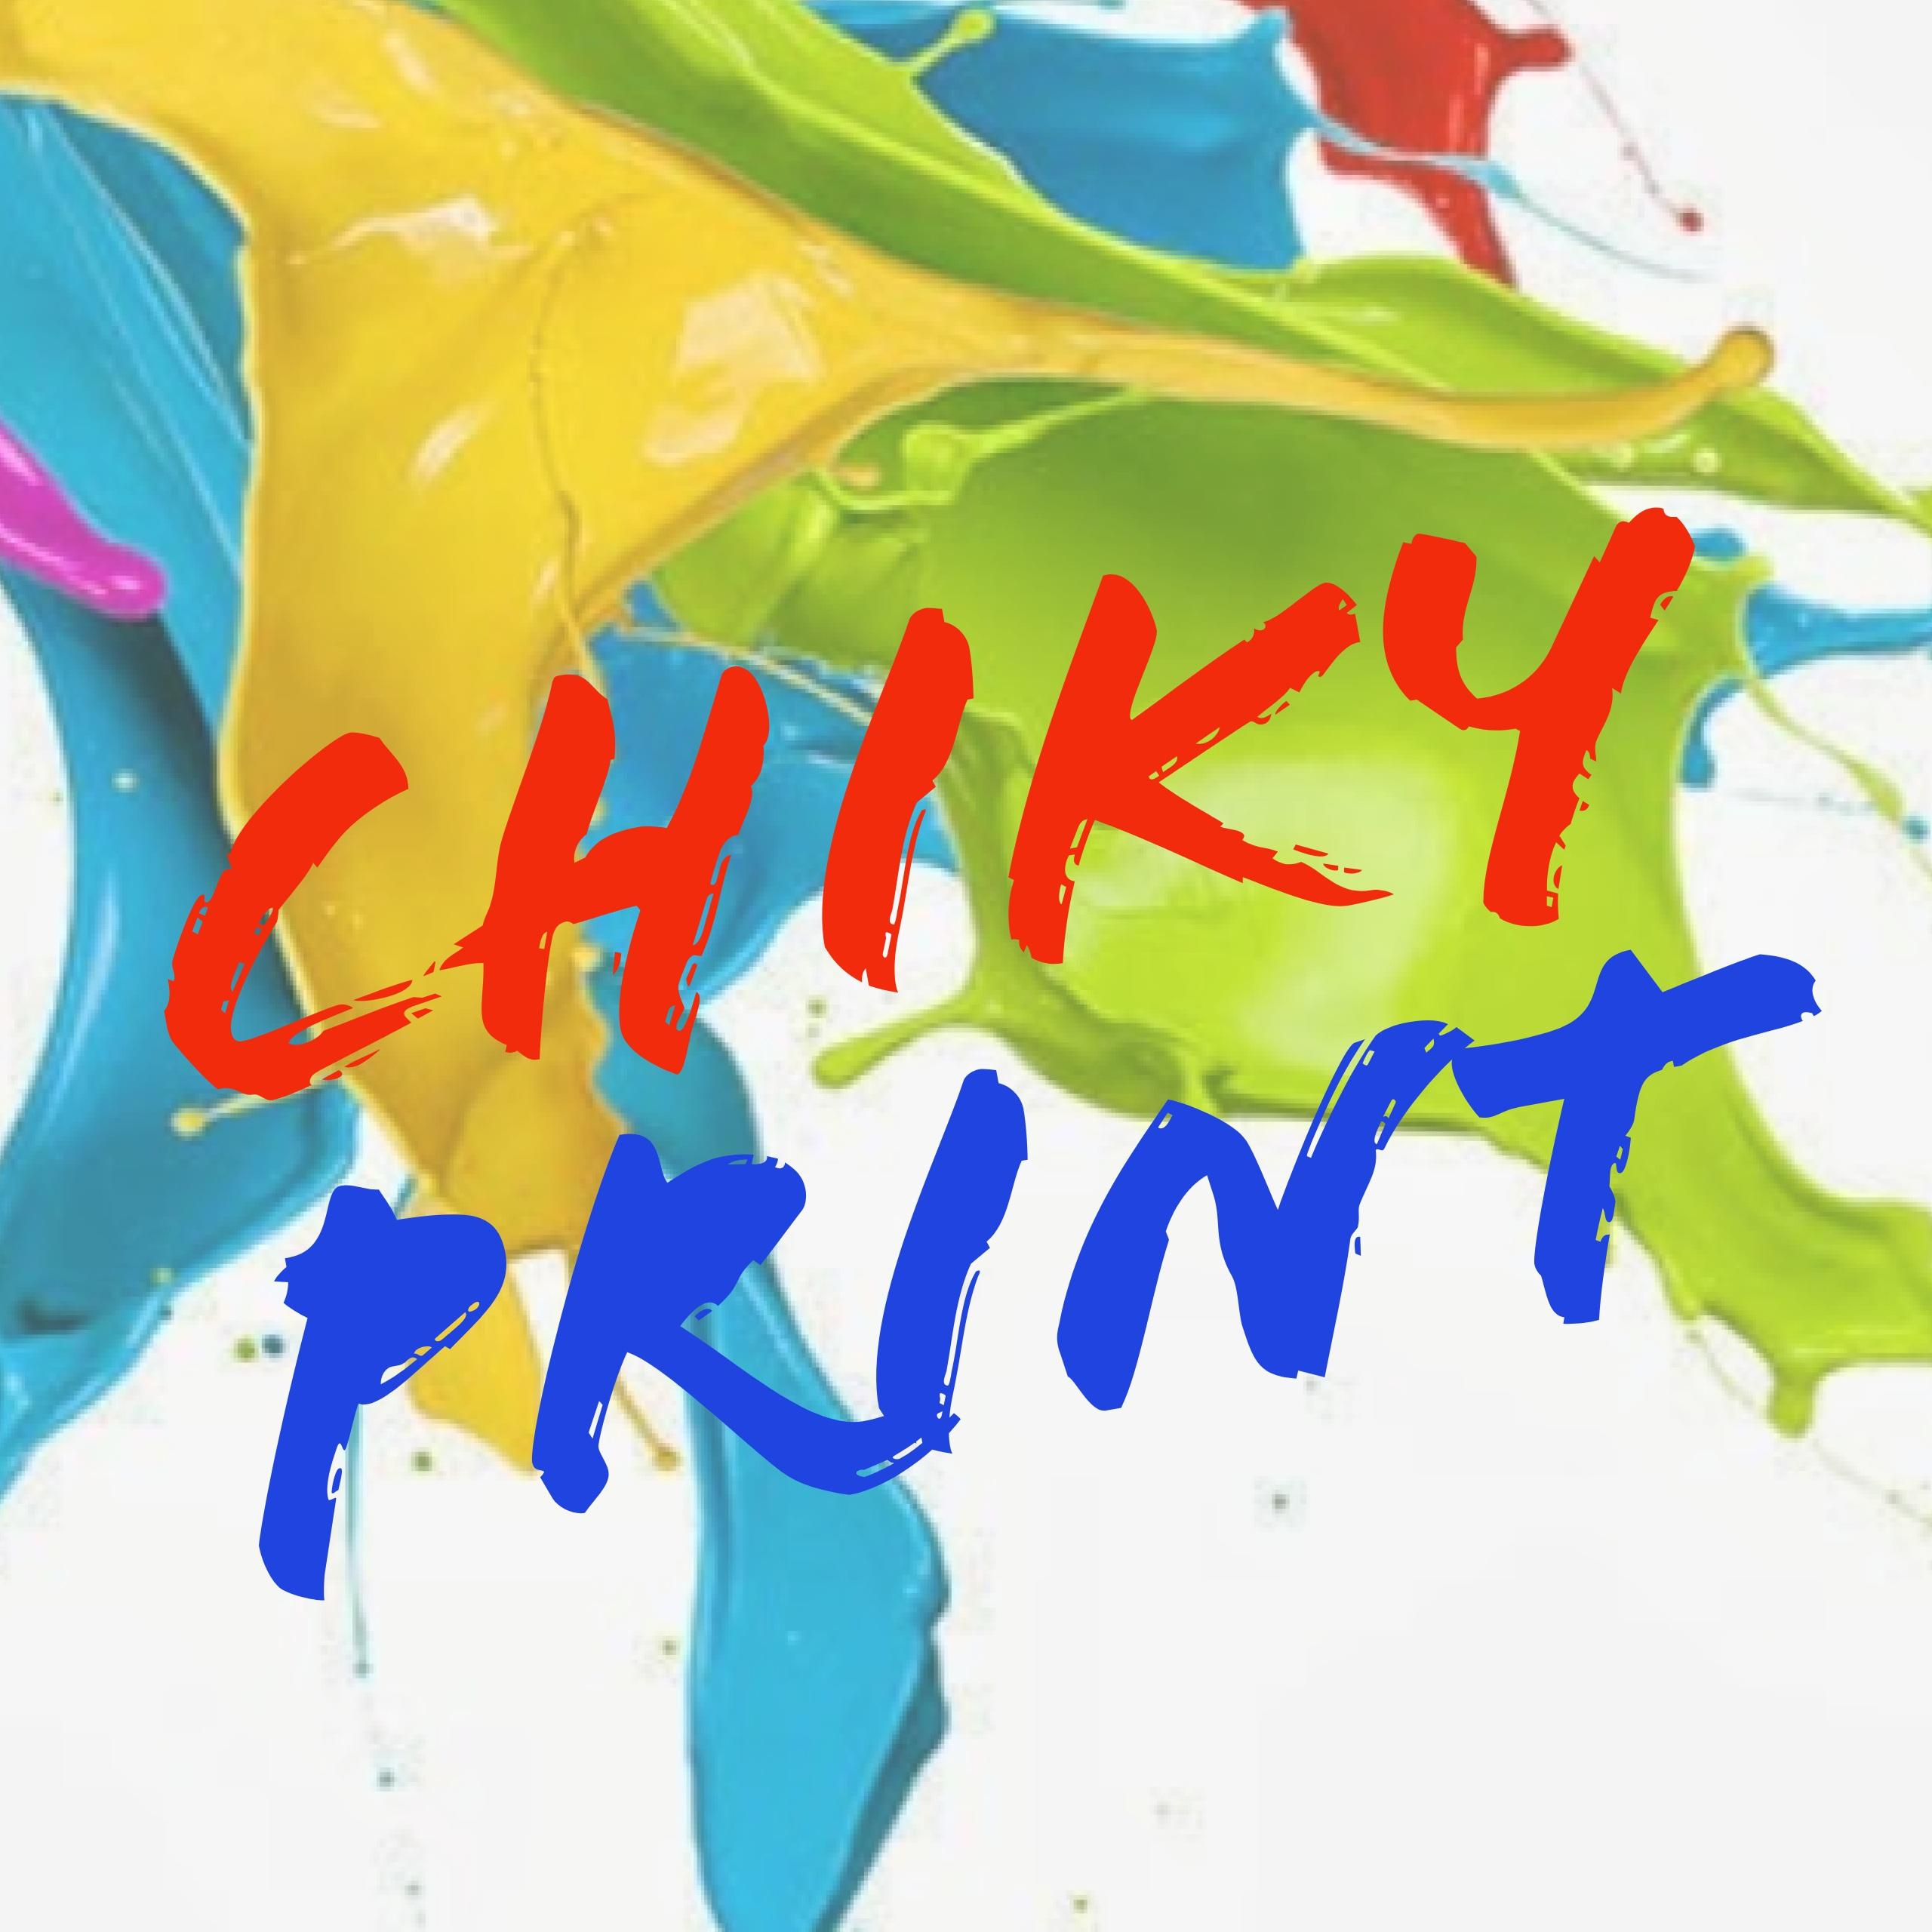 CHIKY PRINT